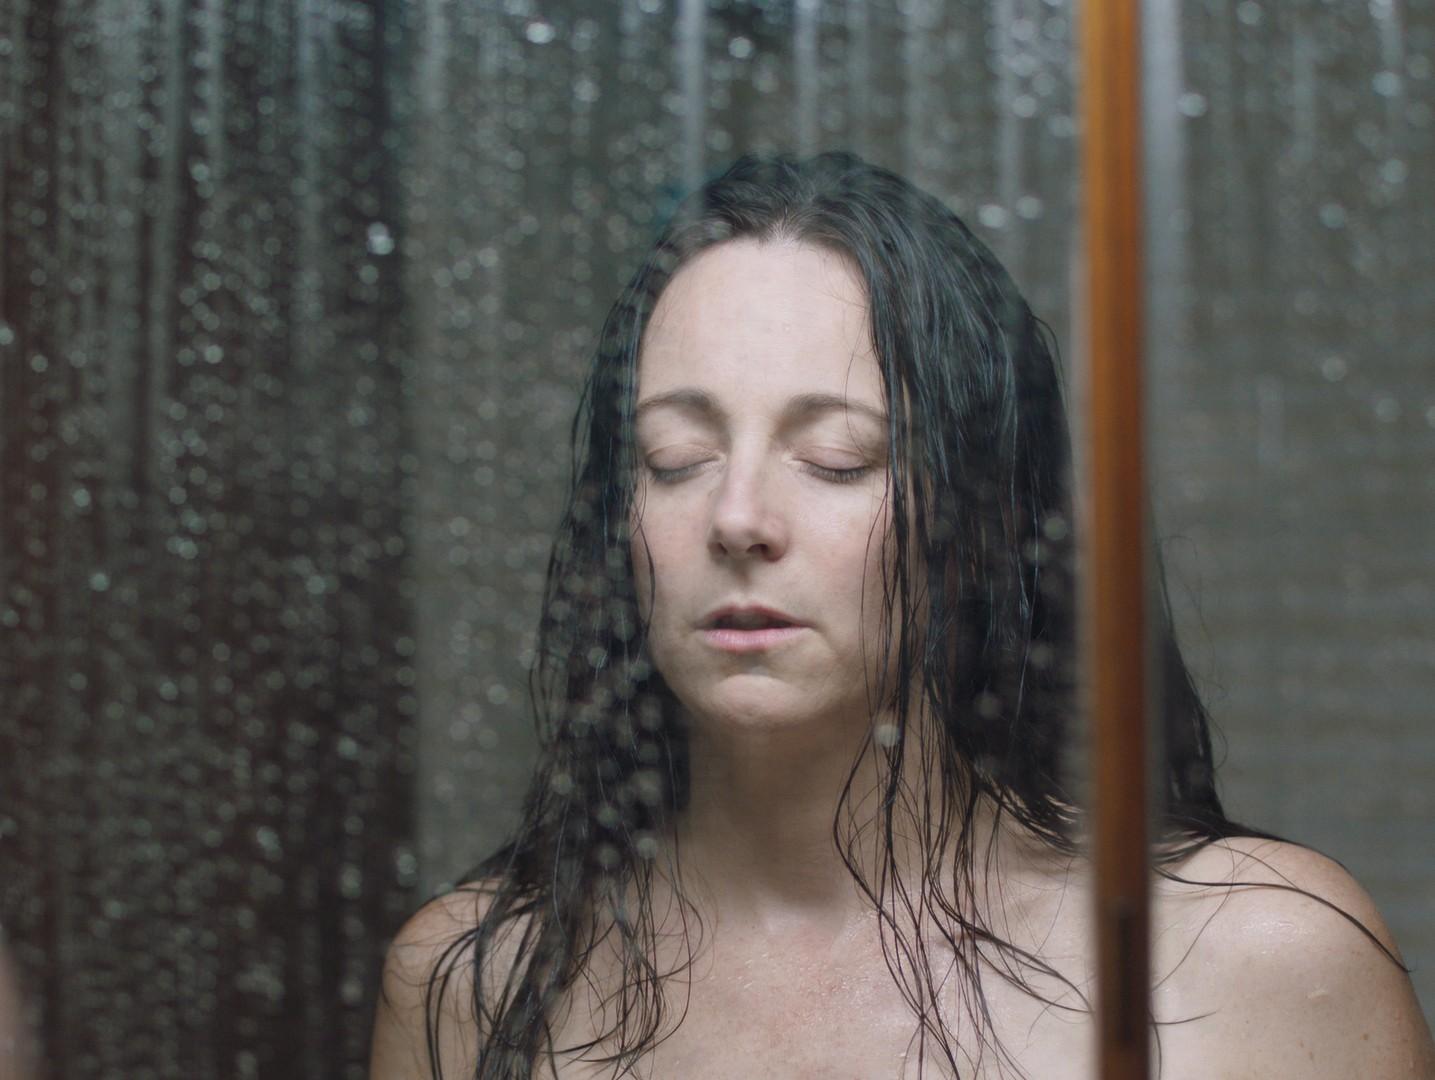 Berlinale 2020: crítica de «Un crimen común», de Francisco Márquez (Panorama)